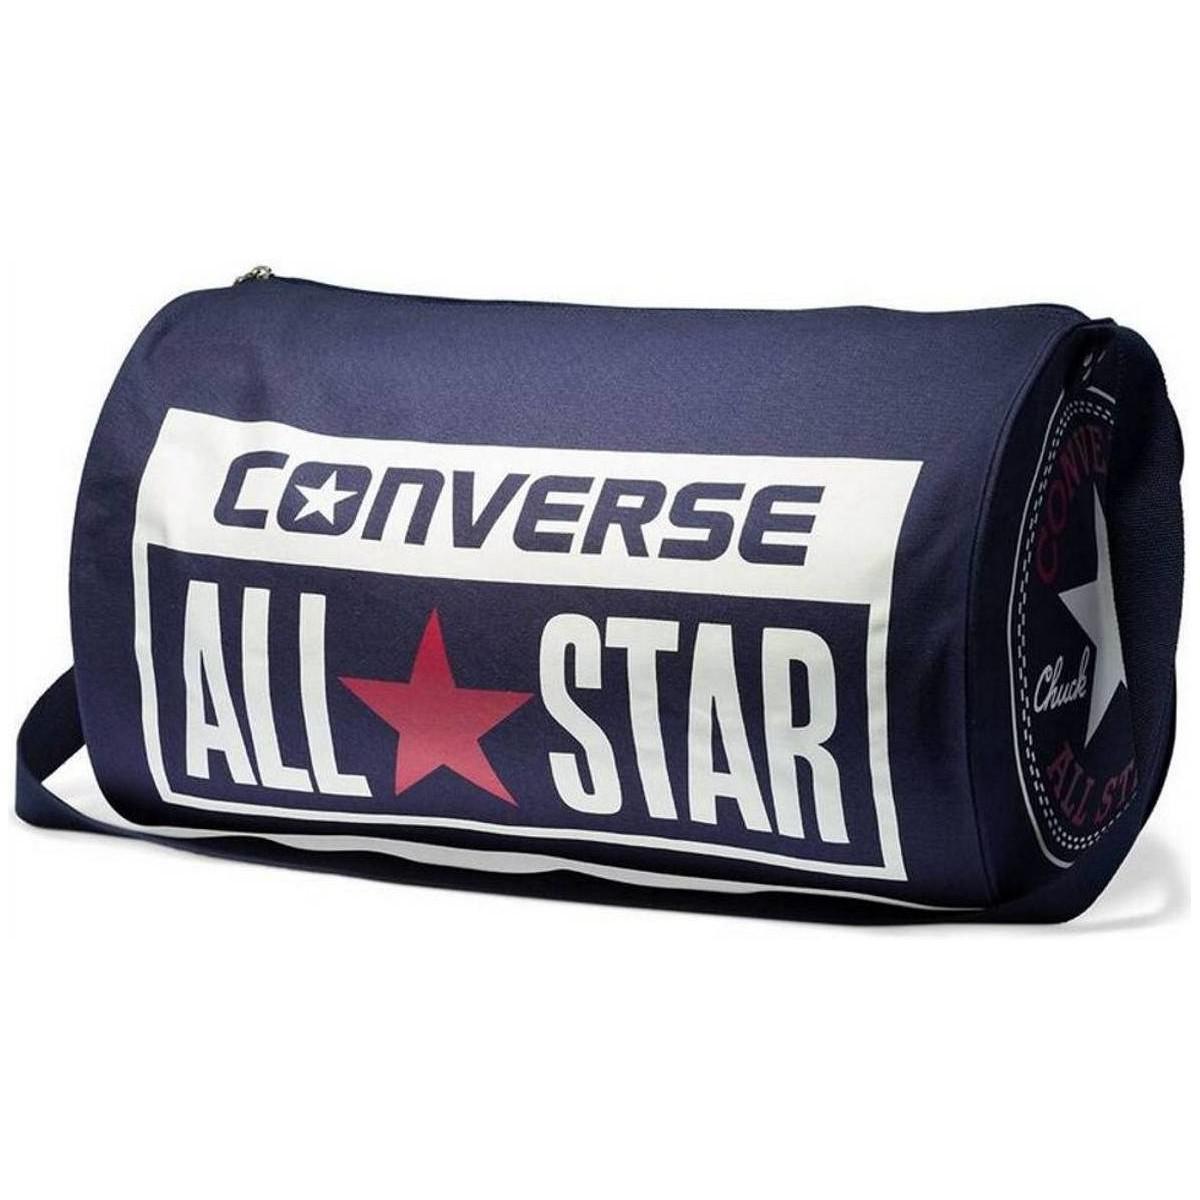 ddb50e077148 Converse Chuck Taylor All Star Legacy Duffle Bag - Navy Men s Sports ...